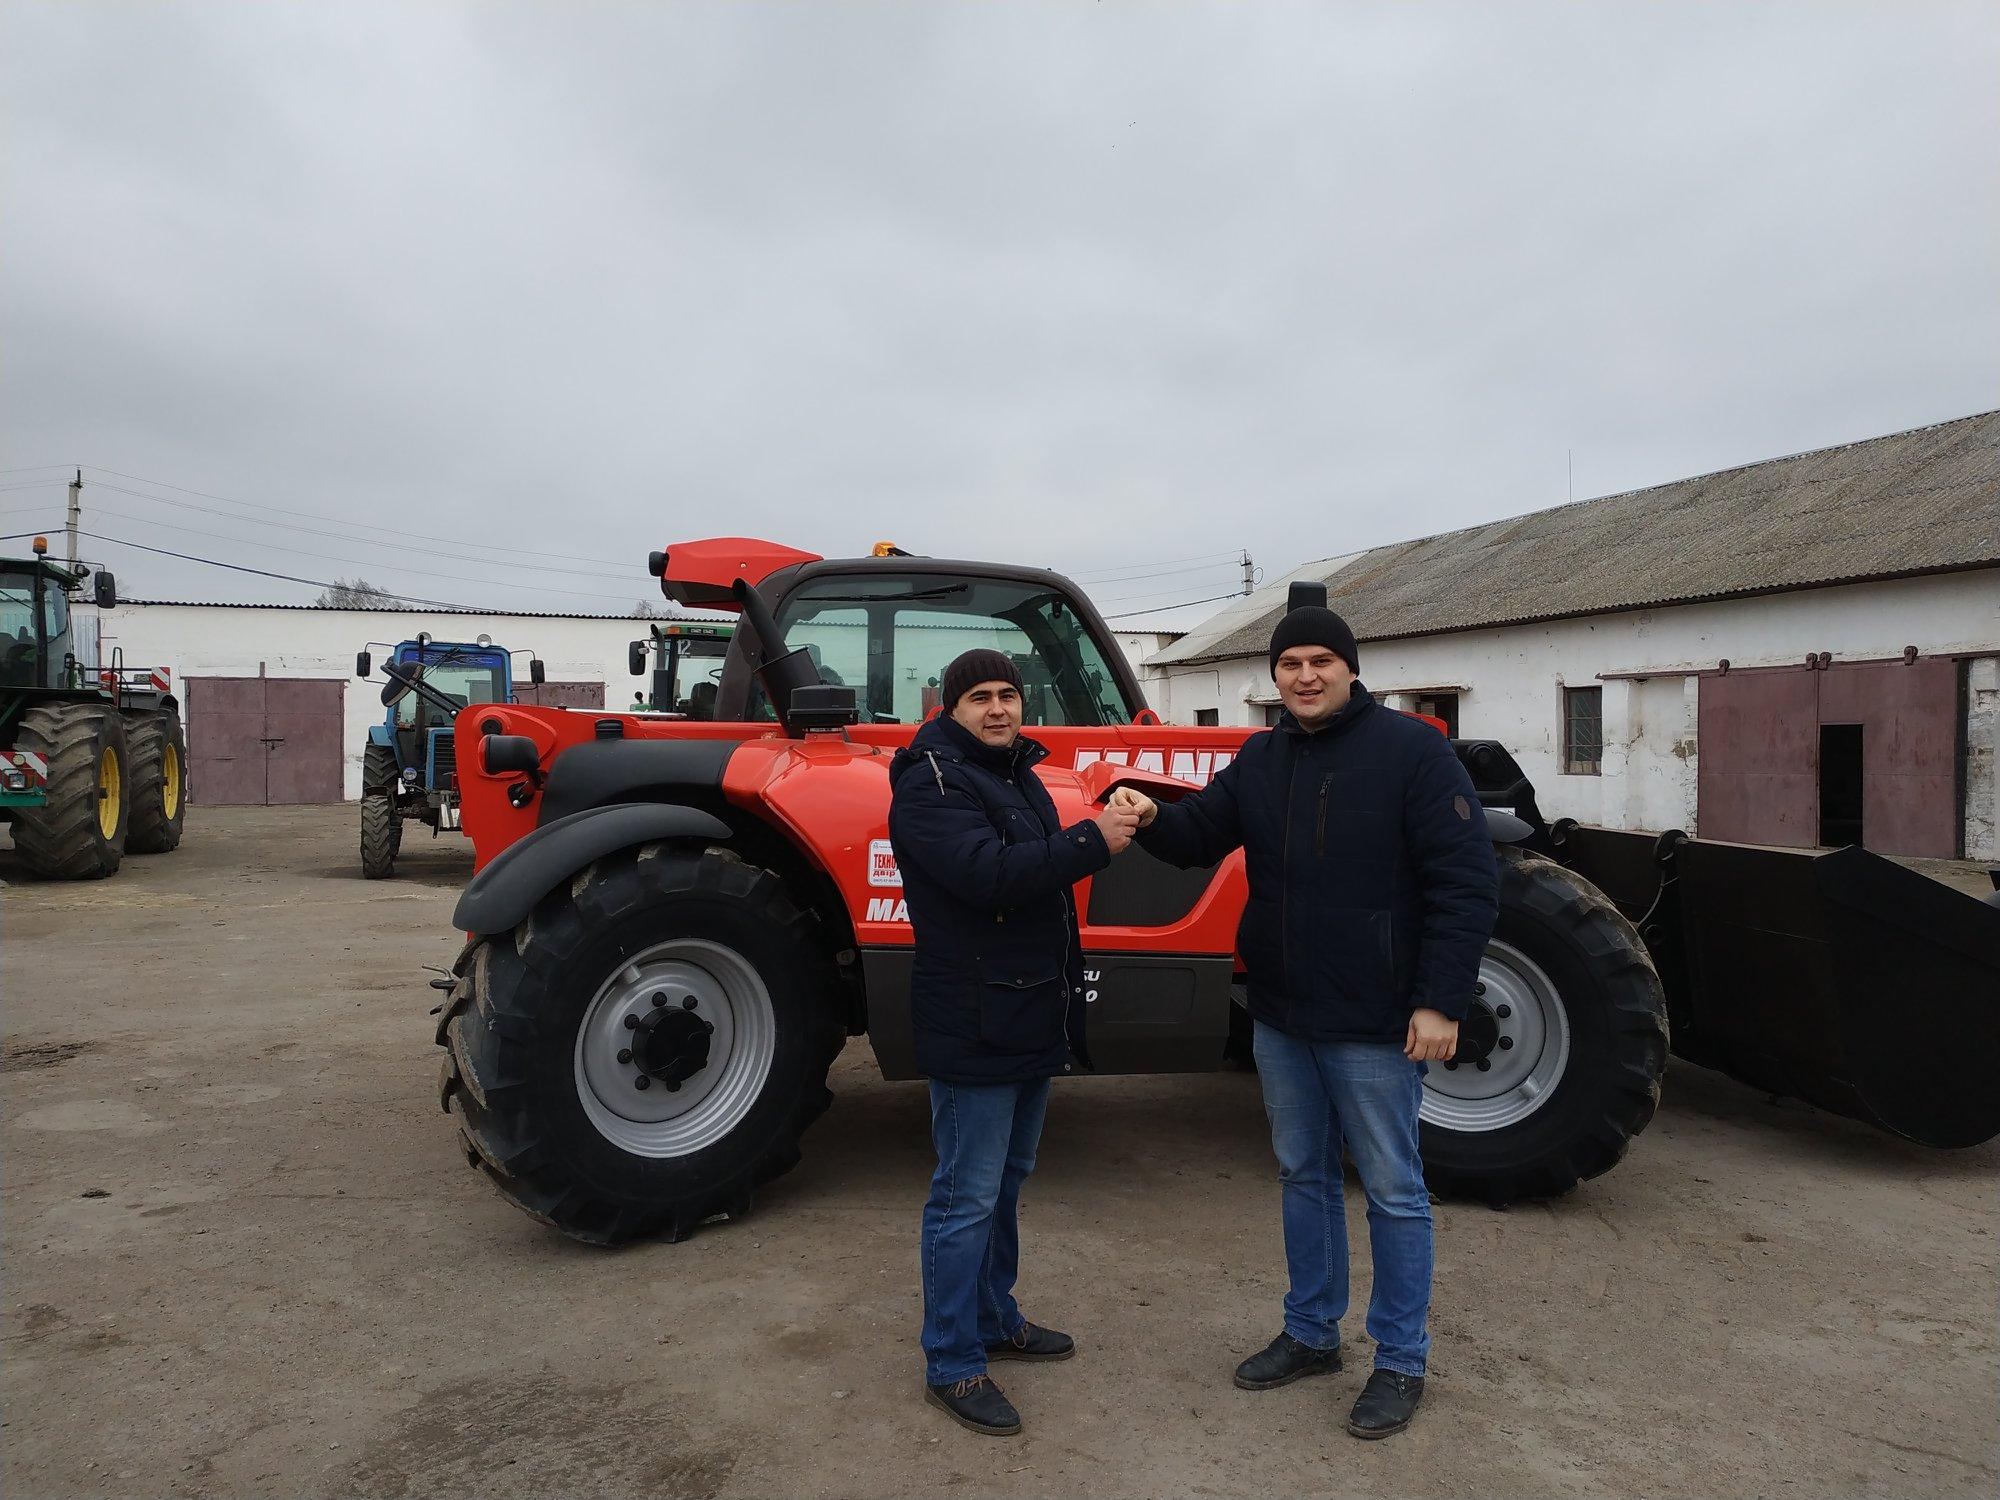 Delivery of three Manitou to the Khmelnytsky region